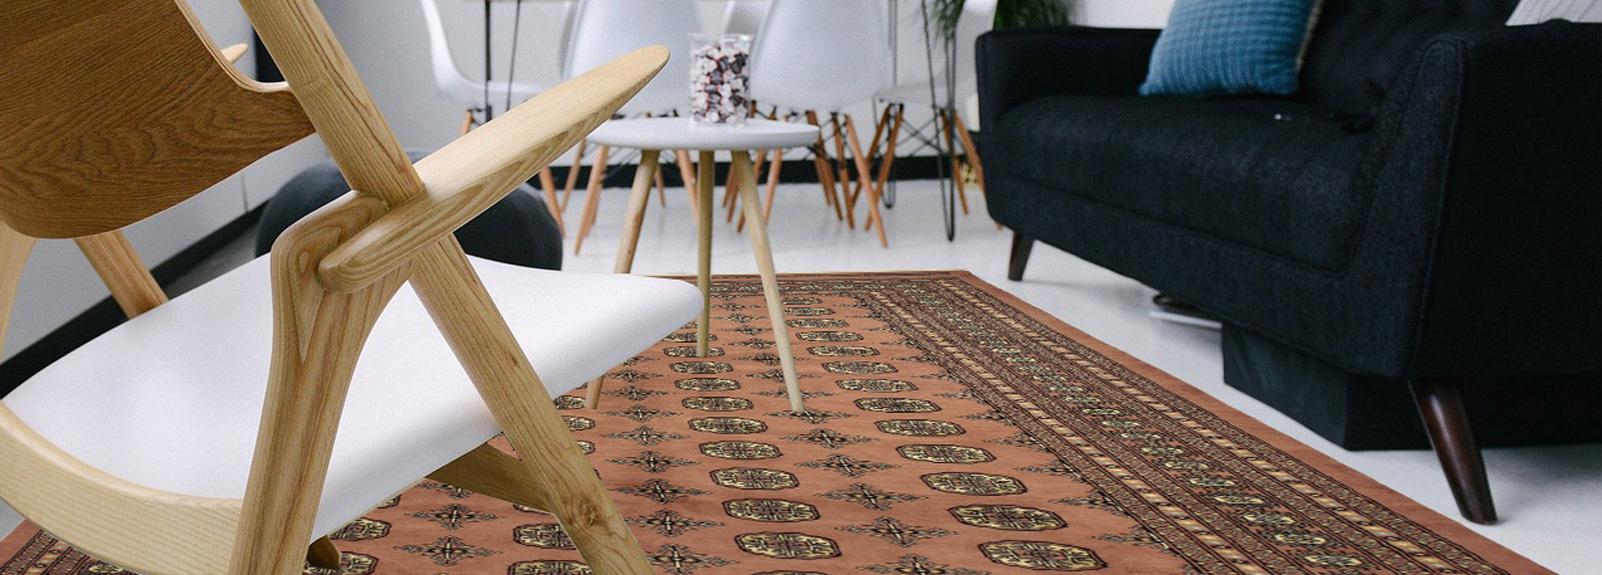 Tappeti usati online outlet tappeti tappeti persiani - Tappeti persiani usati ...